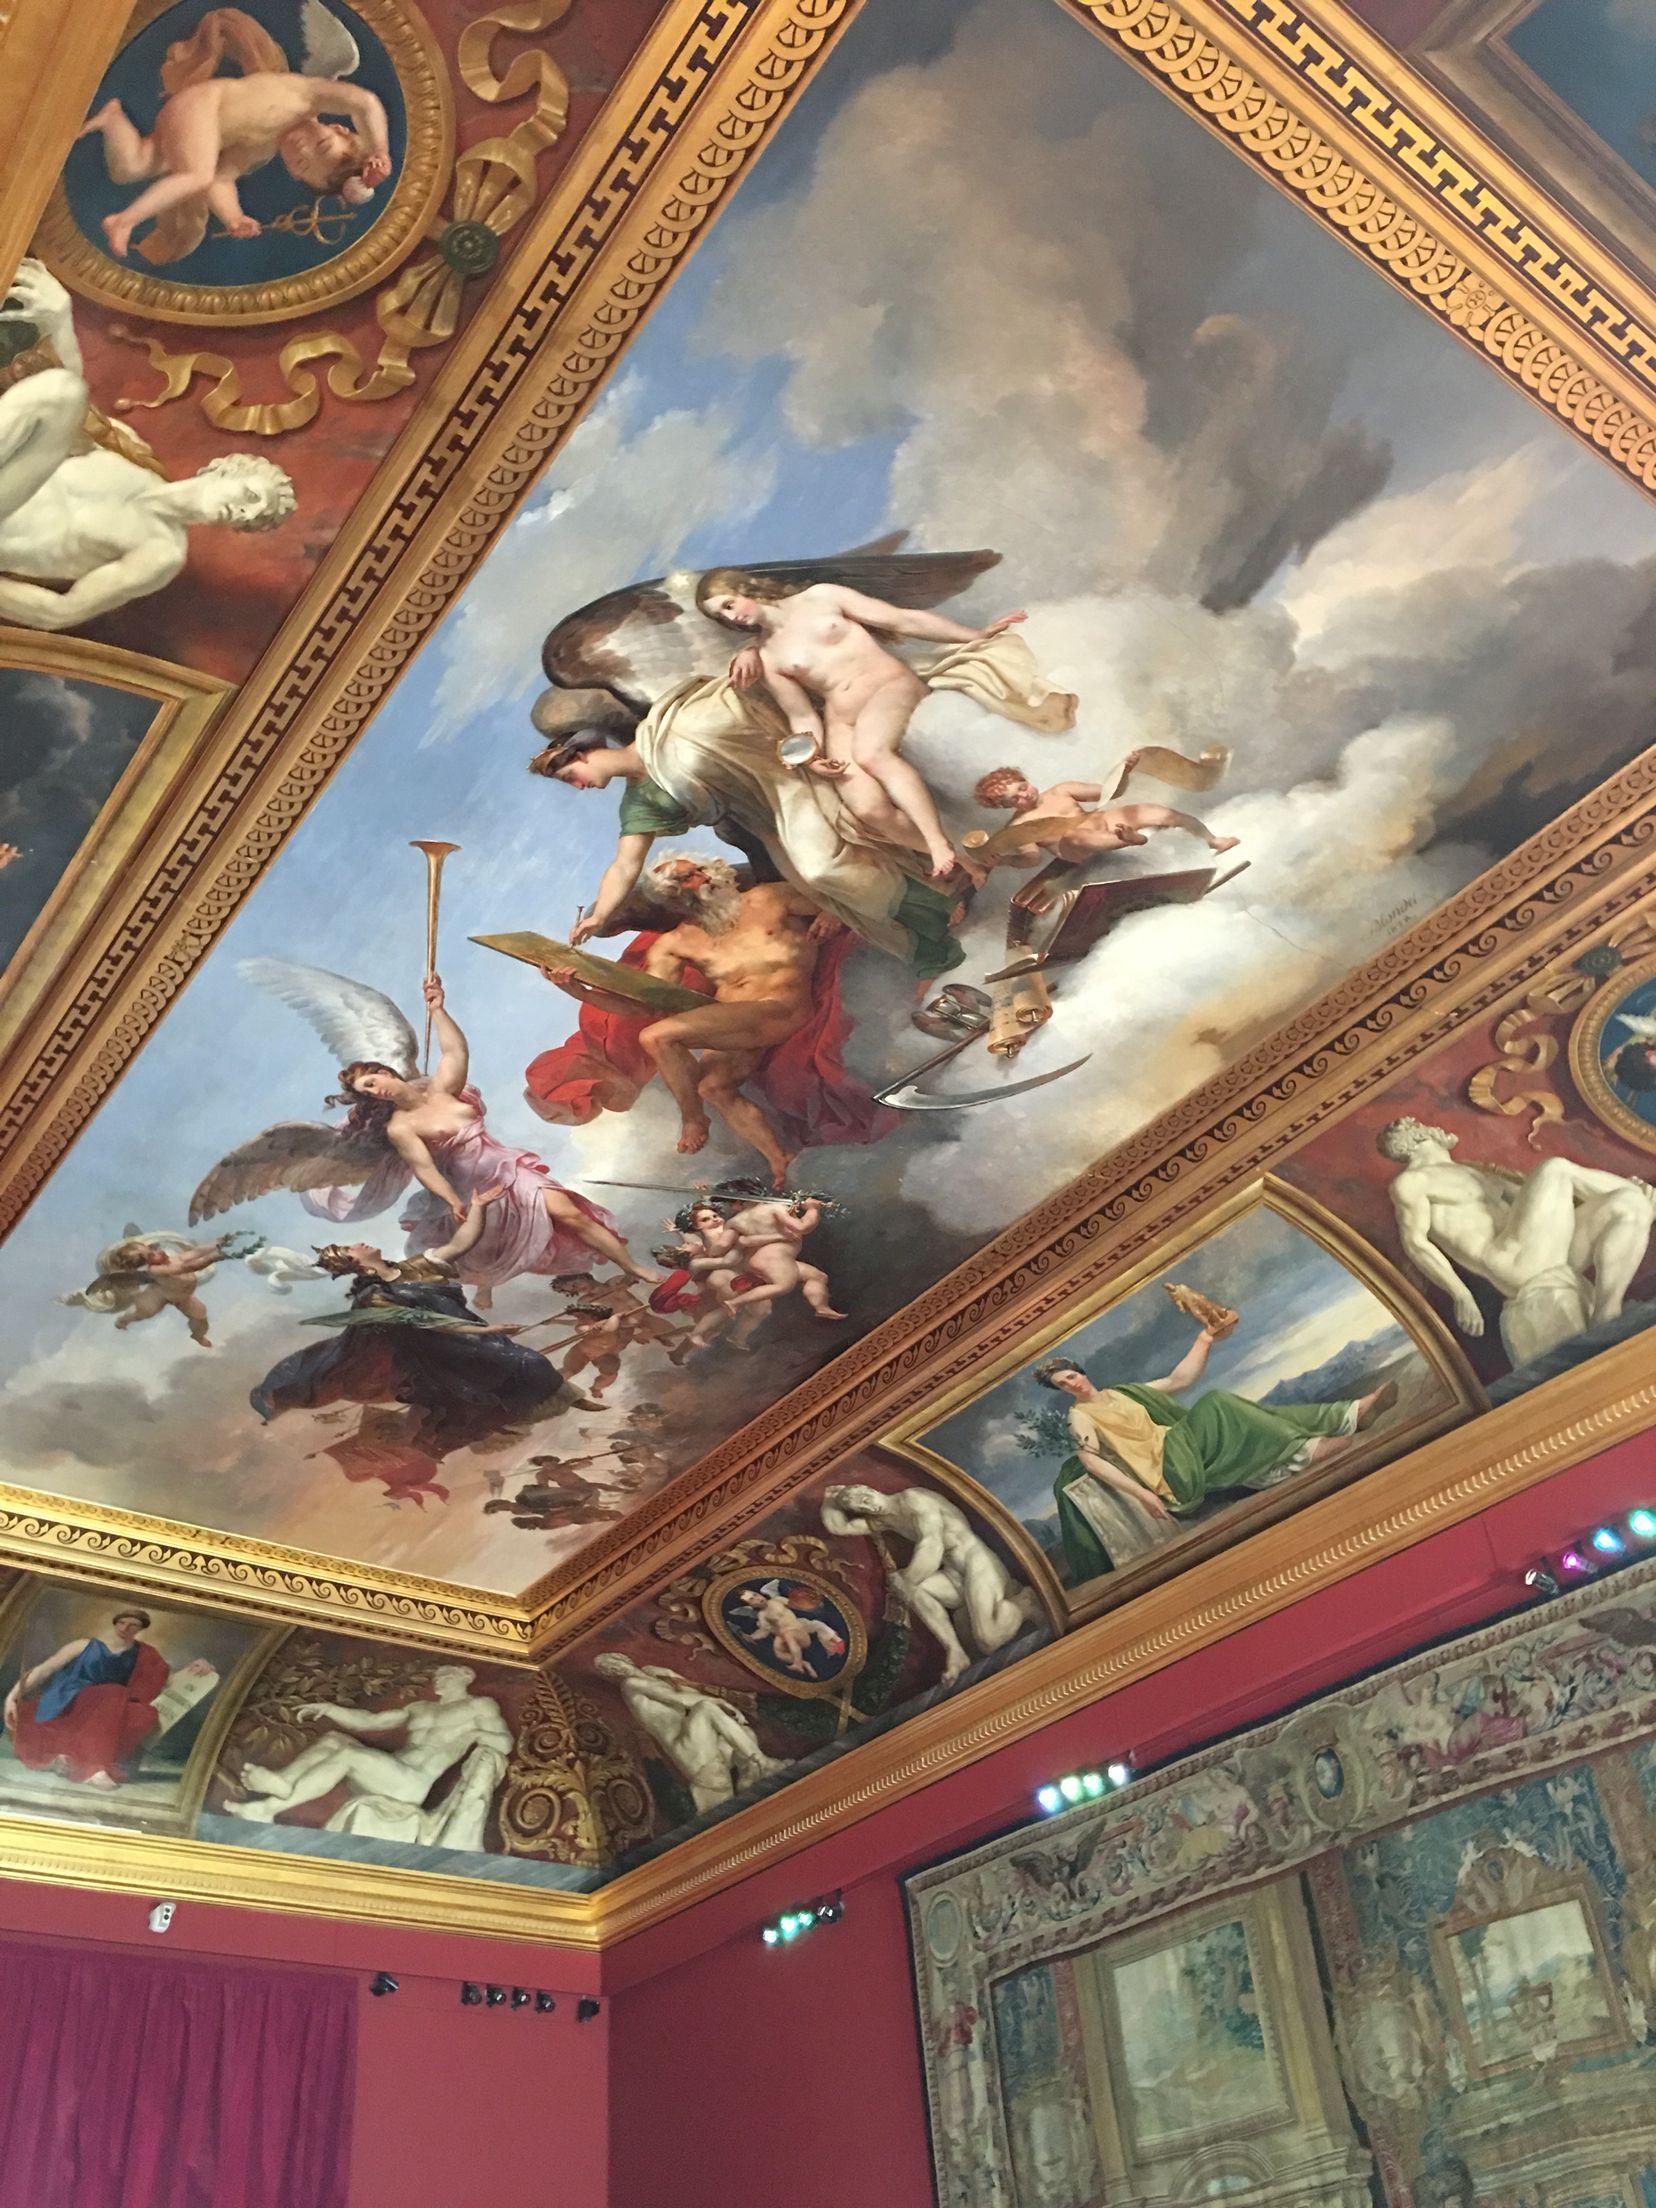 Mural ceiling painting Louvre Paris 2016 UNIQUE ART I in 2019 1656x2208